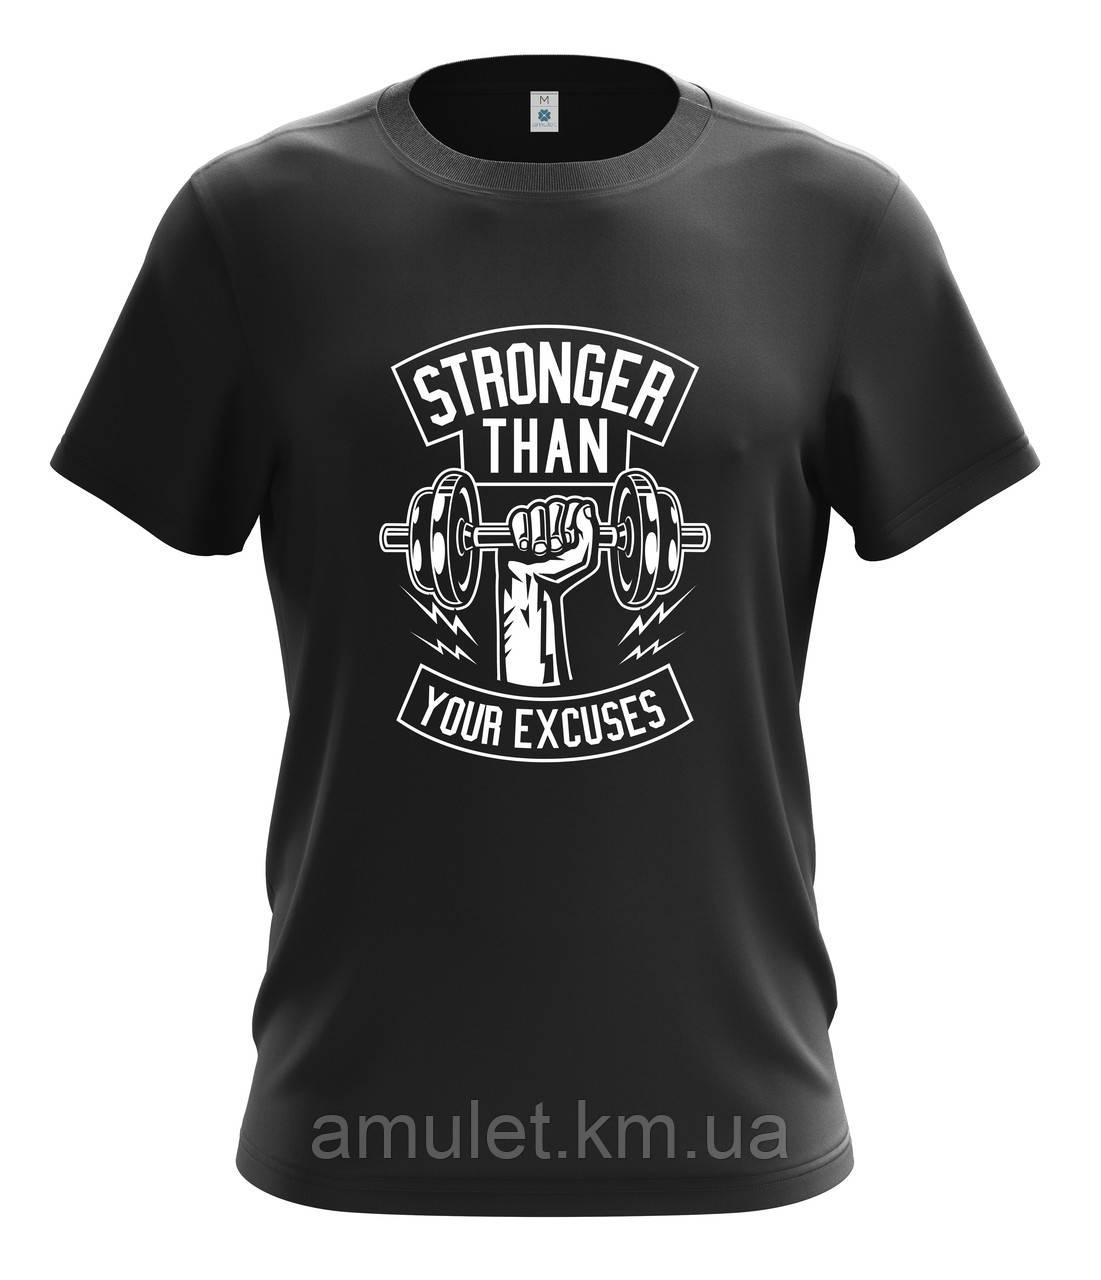 "Футболка мужская спортивная ""Stronger in GYM"" Черный, XXXL"